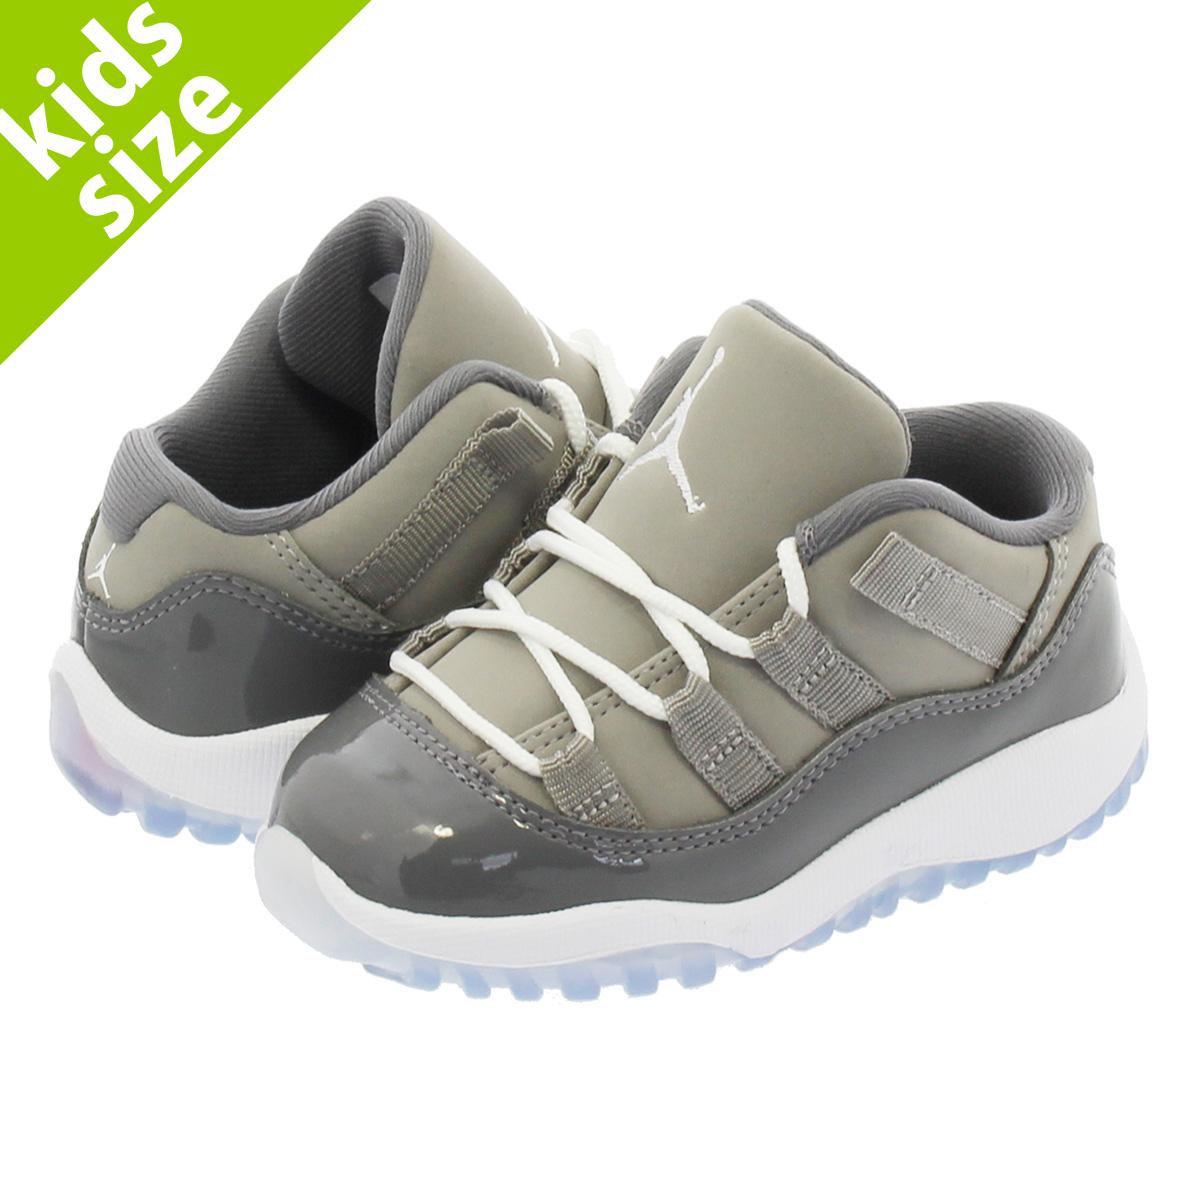 ce588d7ece33 NIKE AIR JORDAN 11 RETRO LOW BT Nike Air Jordan 11 nostalgic low BT MEDIUM  GREY GUMSMOKE WHITE 505